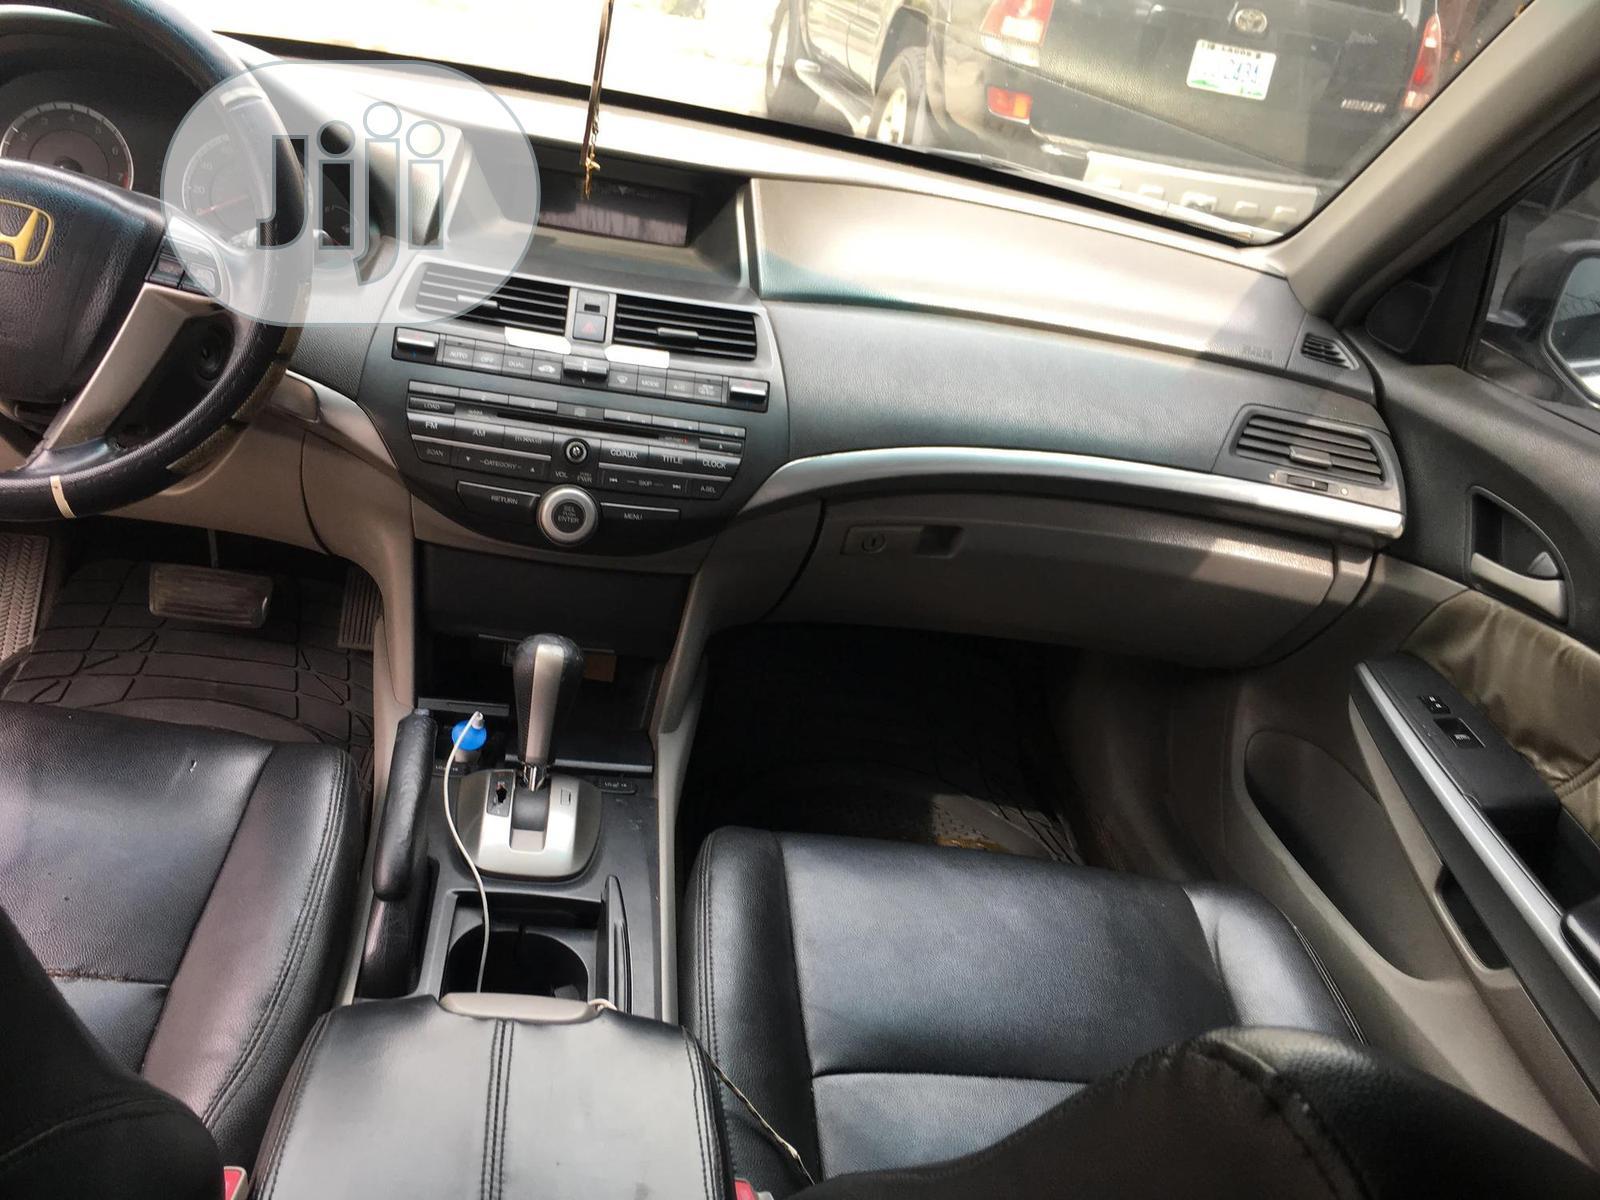 Archive: Honda Accord 2008 2.4 LX Automatic Silver